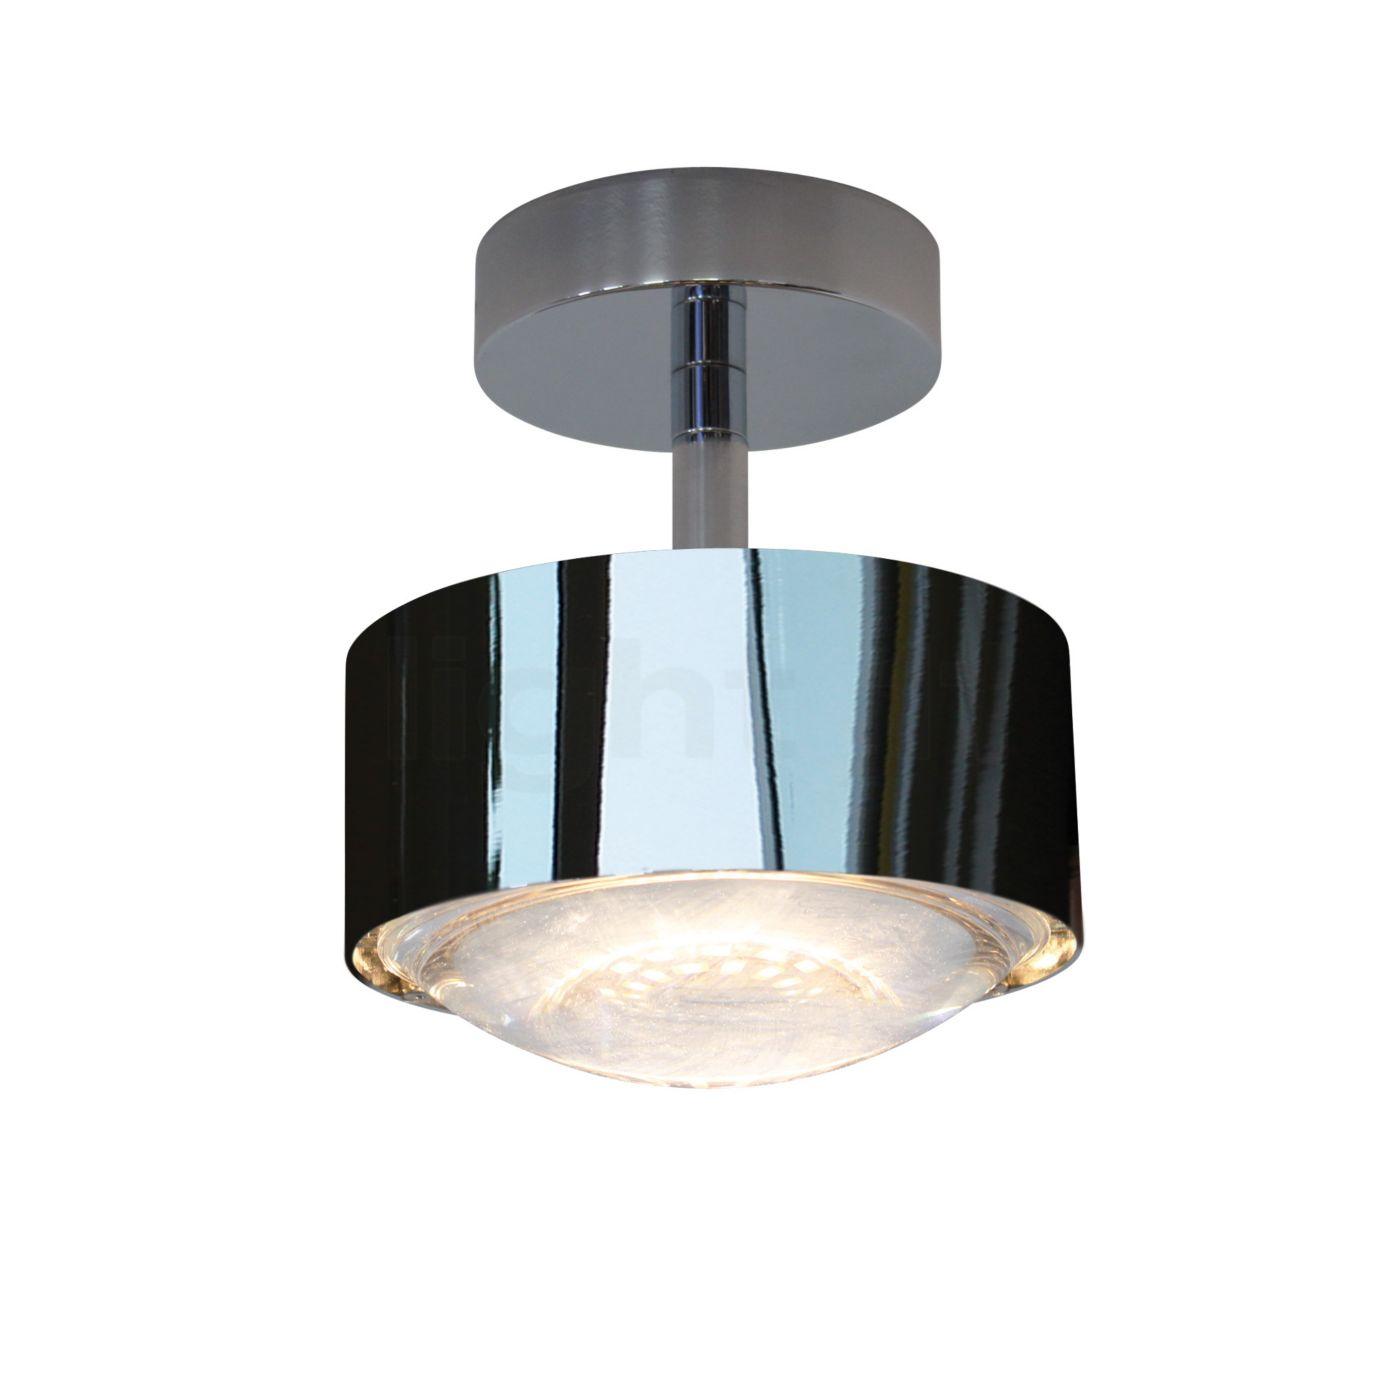 top light puk turn downlight led plafonnier. Black Bedroom Furniture Sets. Home Design Ideas